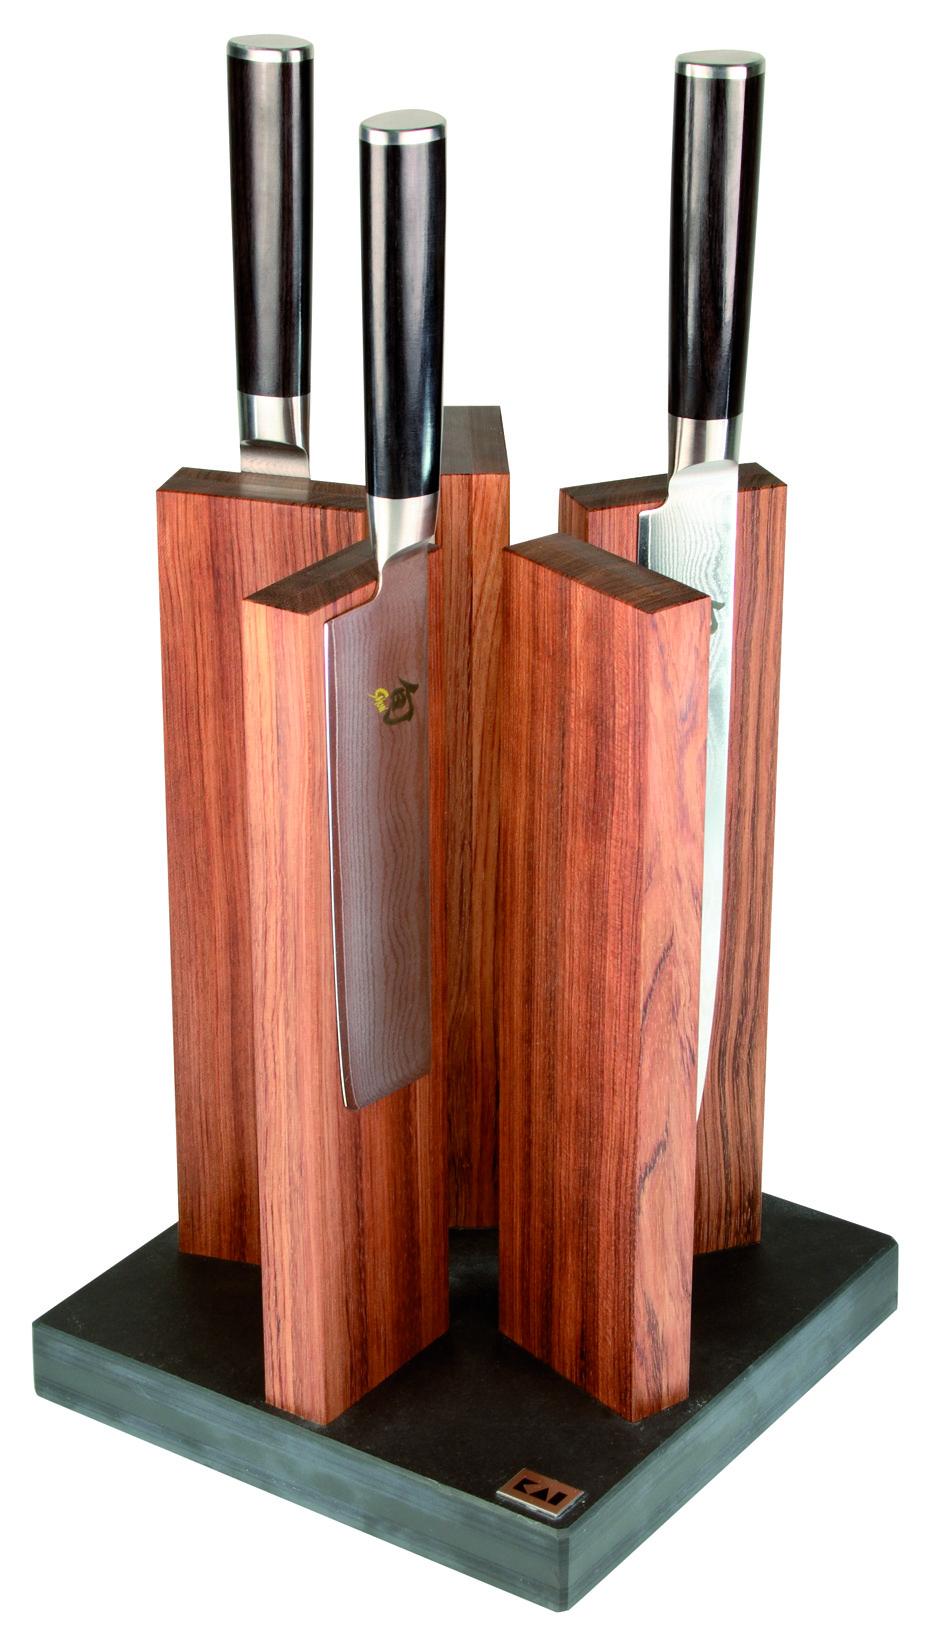 kai magnet messerblock stonehenge sth 1 red wood schiefer ohne messer. Black Bedroom Furniture Sets. Home Design Ideas